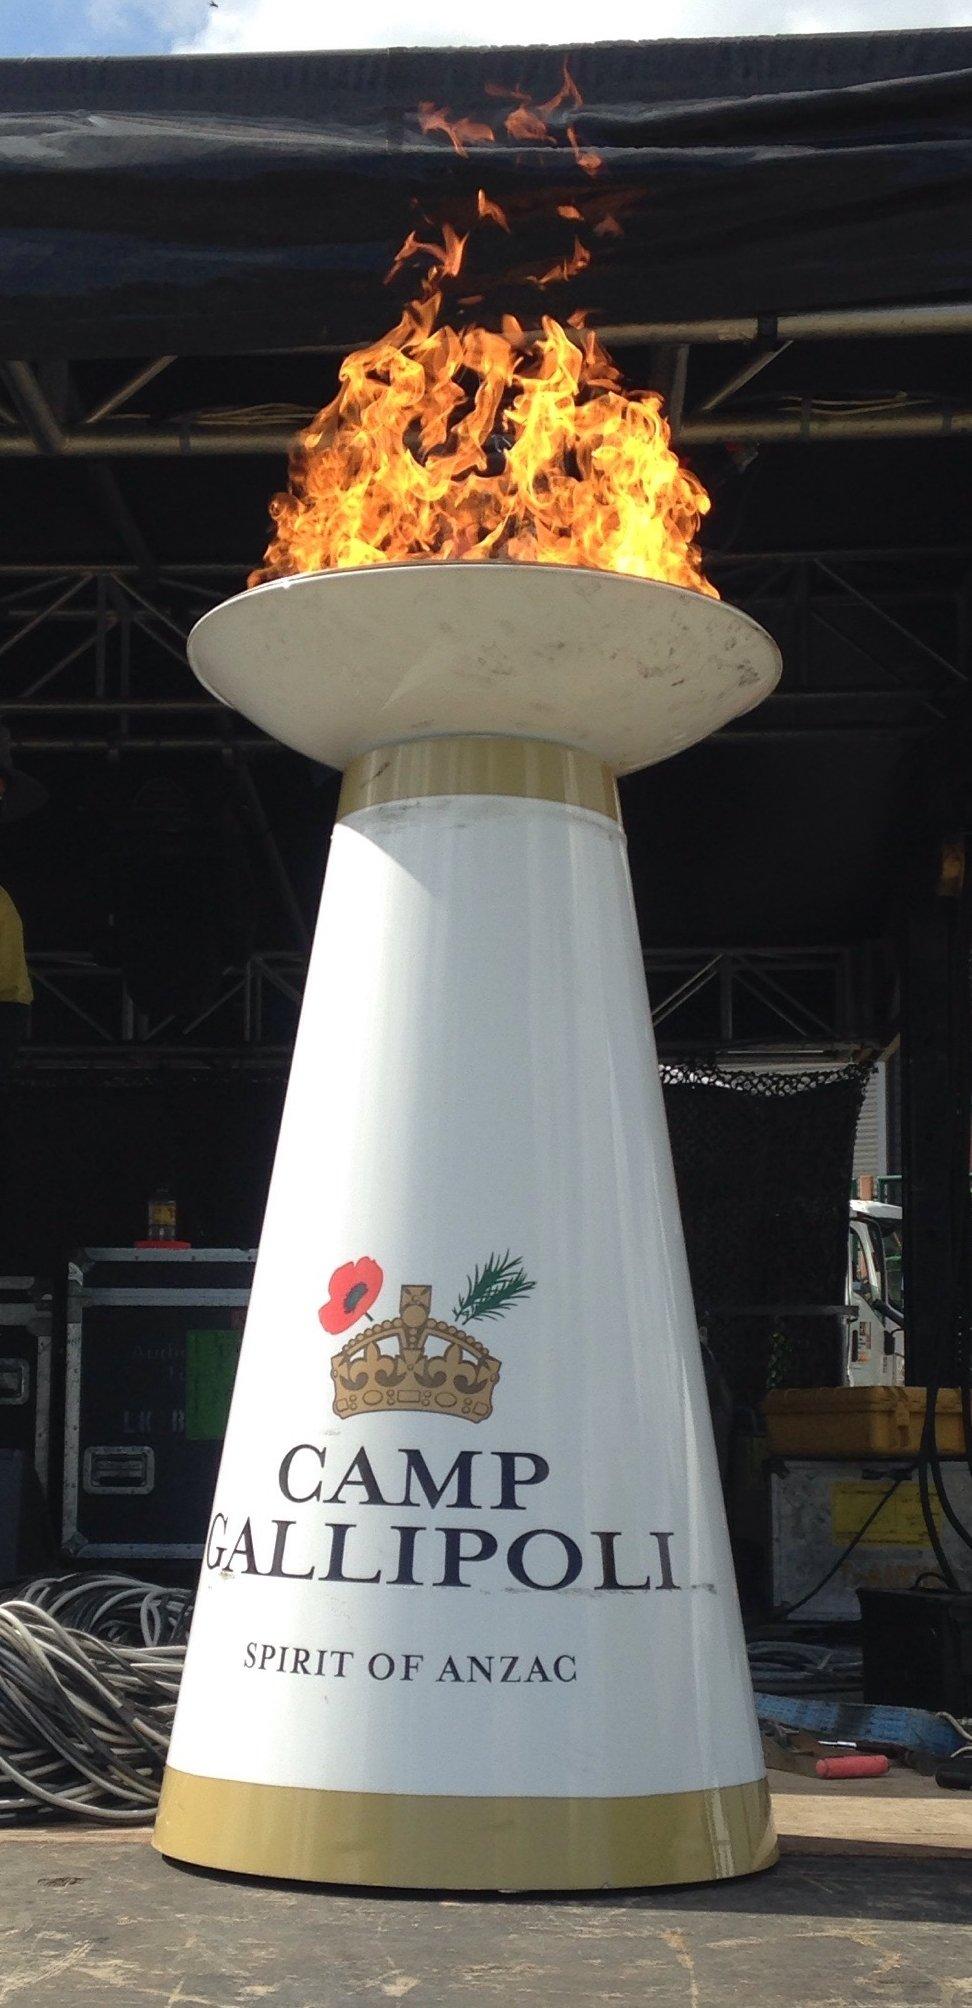 Camp Gallipoli Remembrance Cauldron